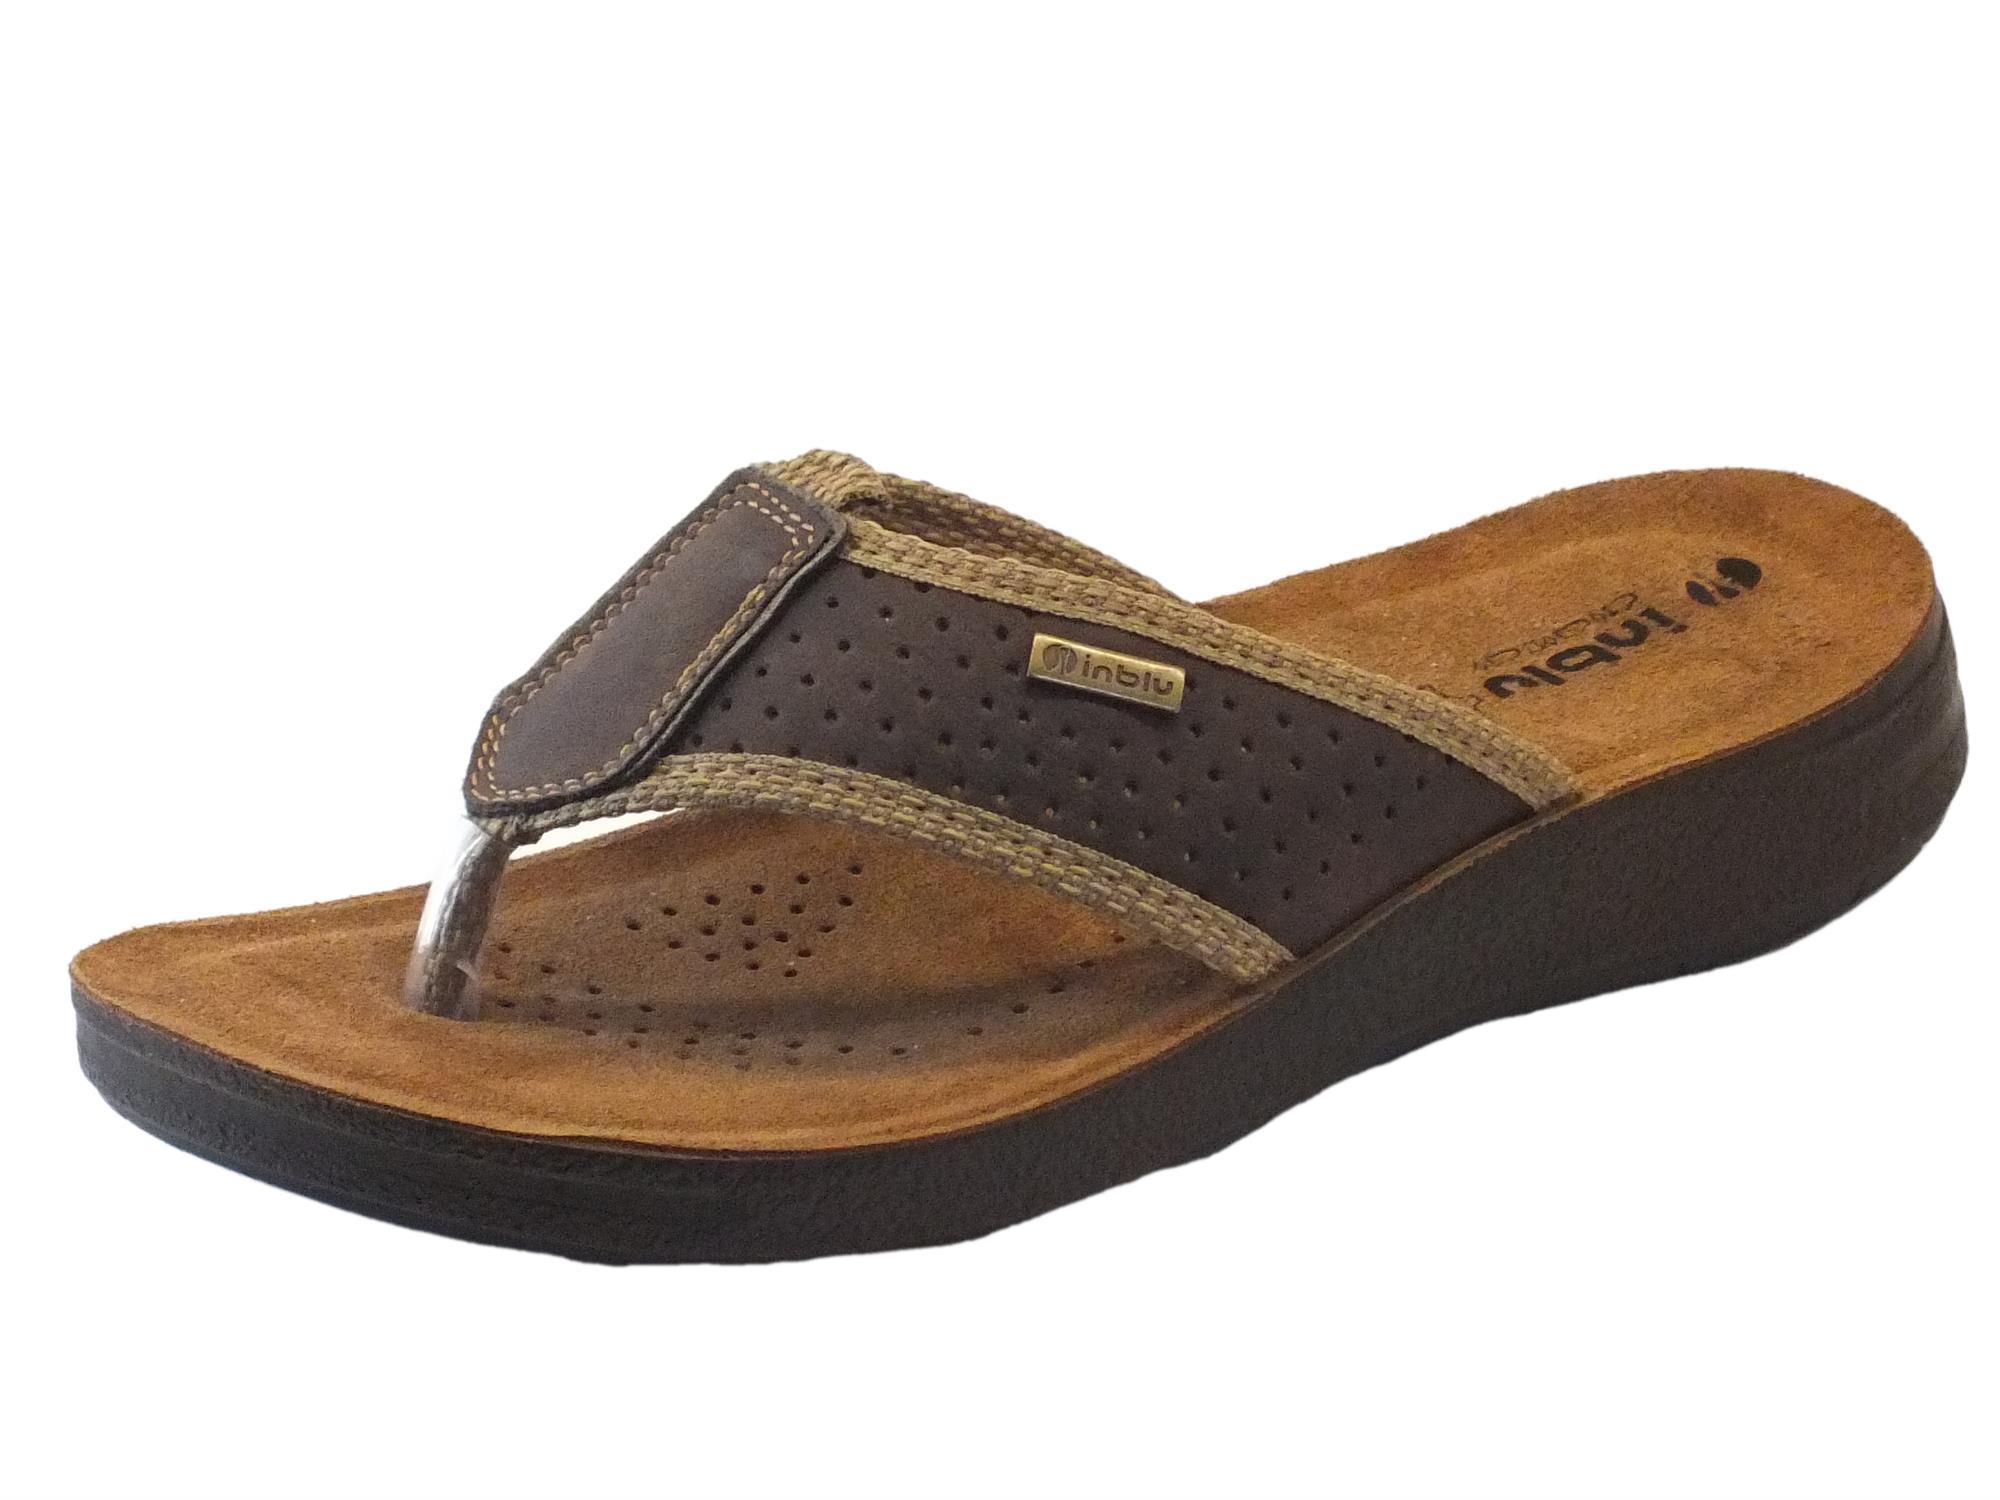 Calzature & Accessori marroni per uomo Inblu